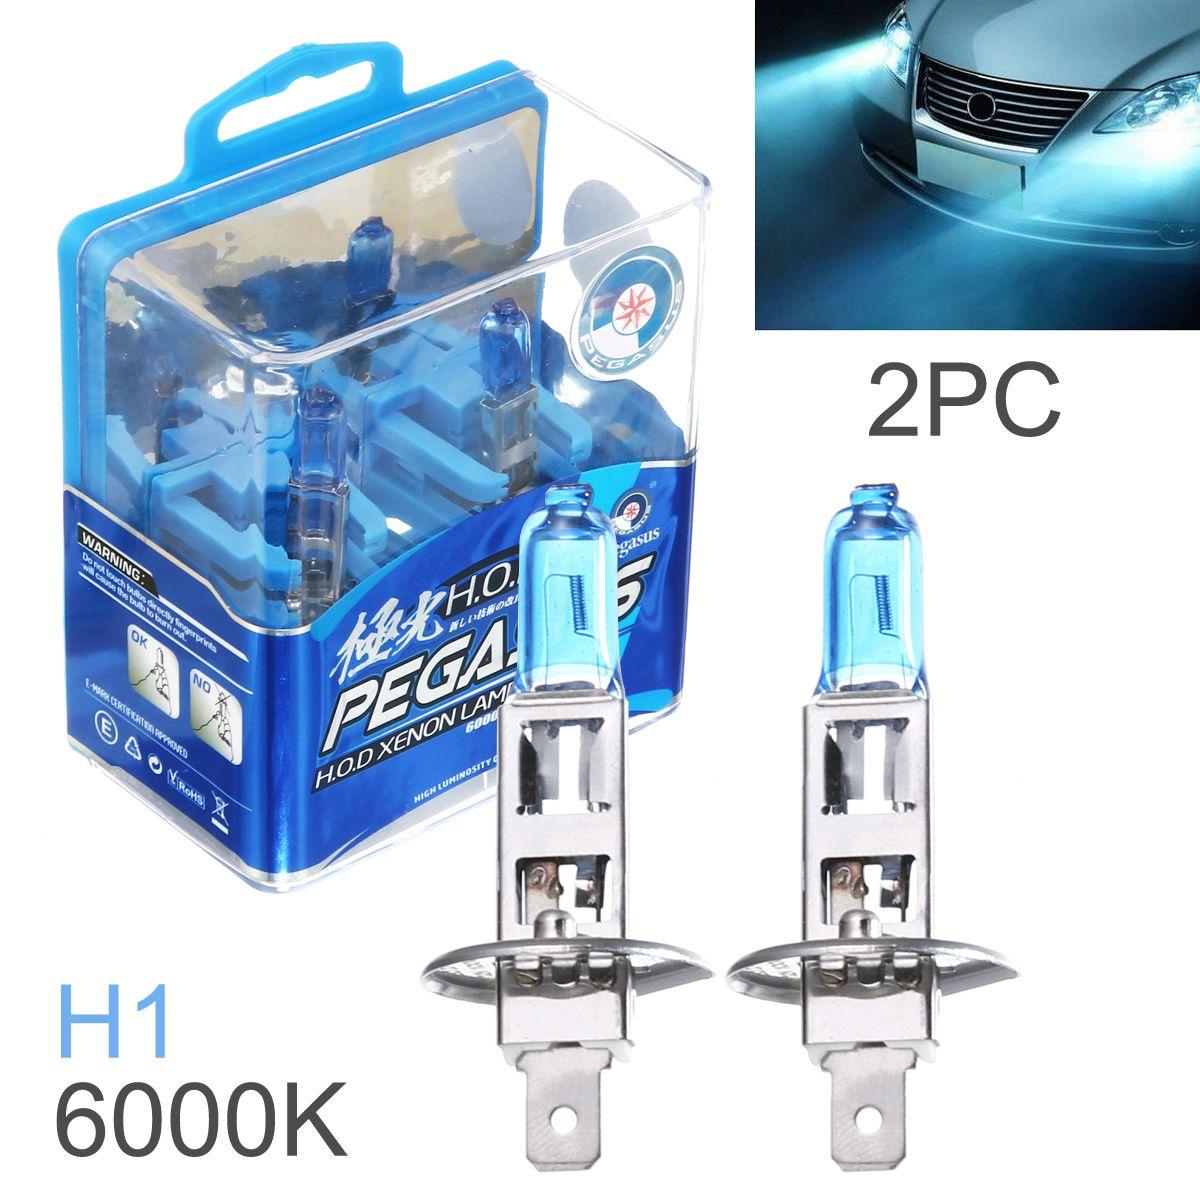 DHL Wholesale H1 100W White Light Super Bright Car HOD Xenon Halogen Lamp Auto Front Headlight Fog Bulb CLT_60X